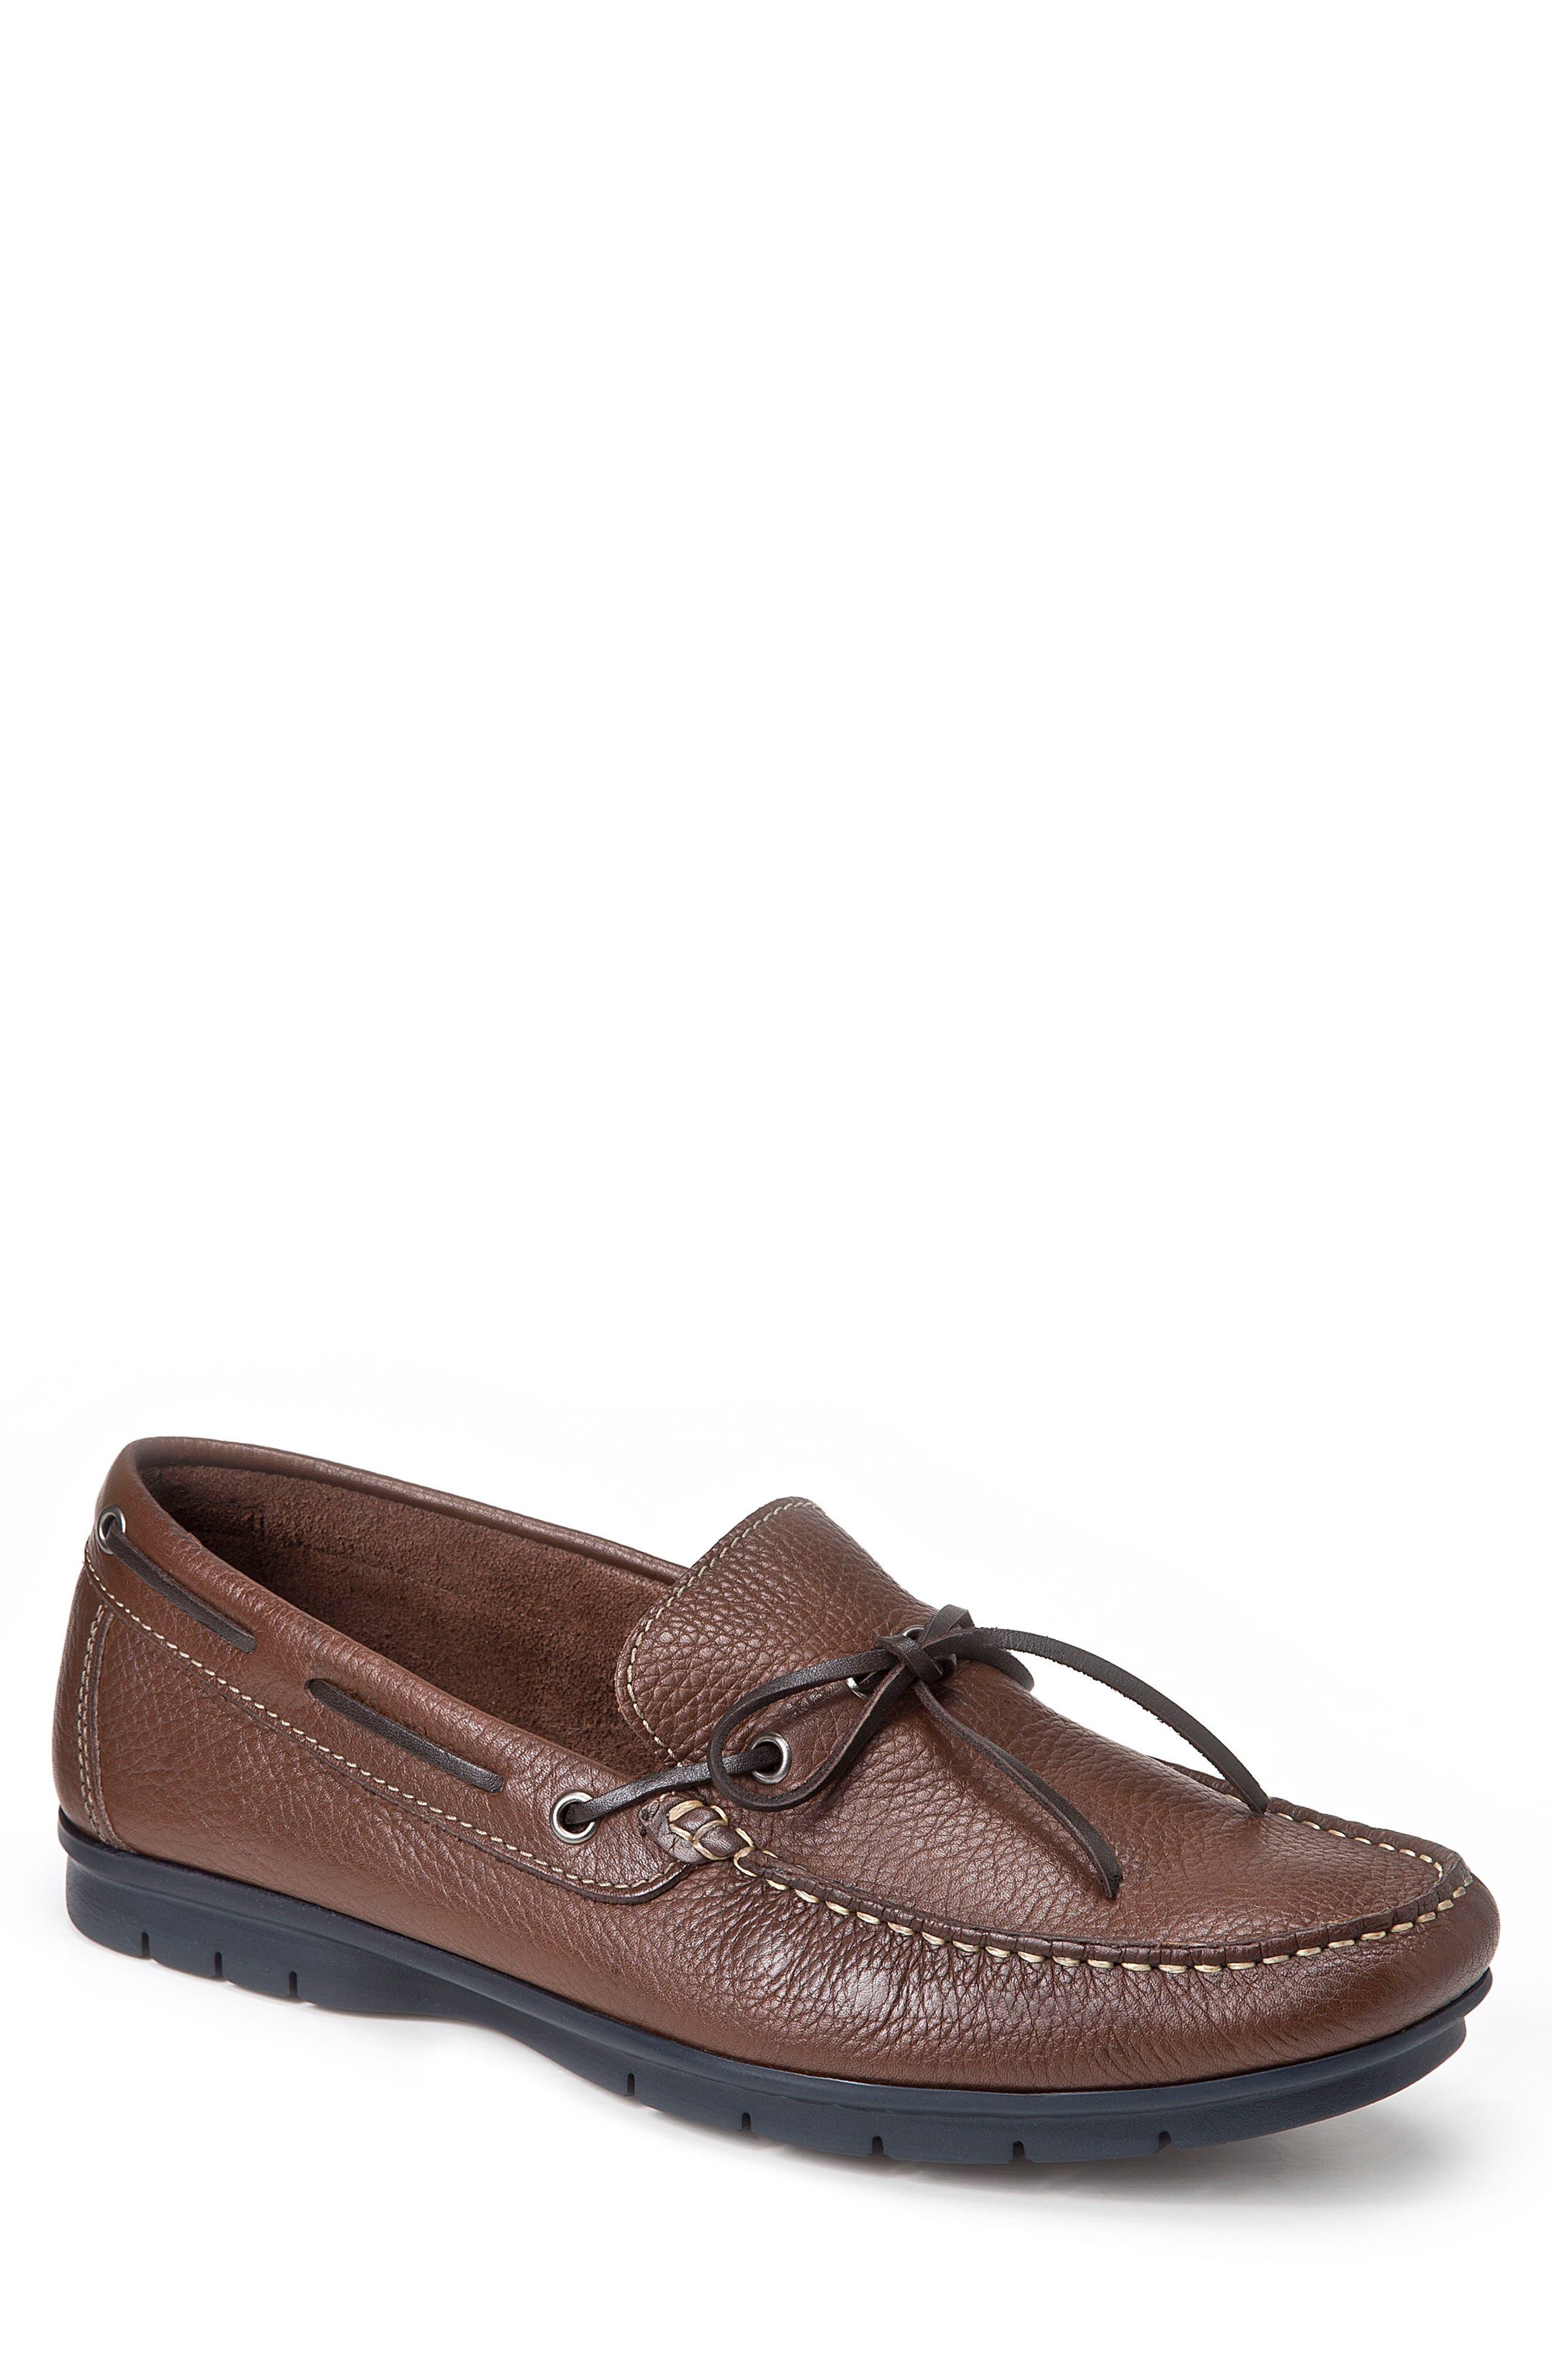 SANDRO MOSCOLONI Ribalto Boat Shoe